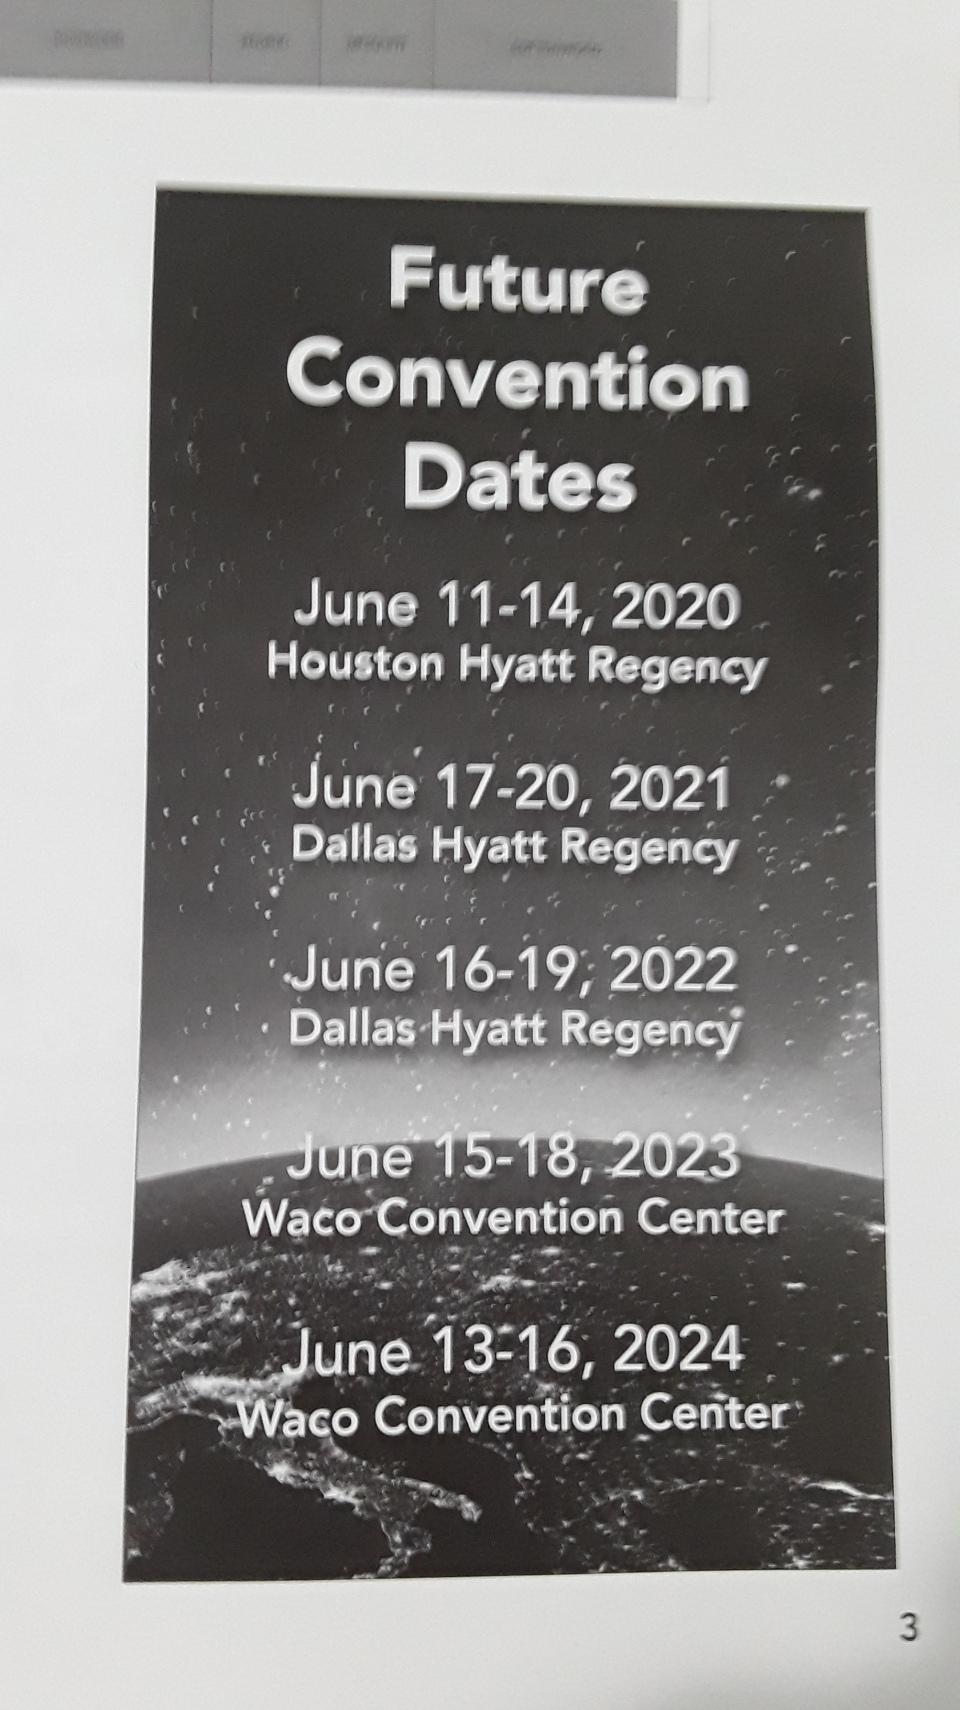 Future-Convention-Dates